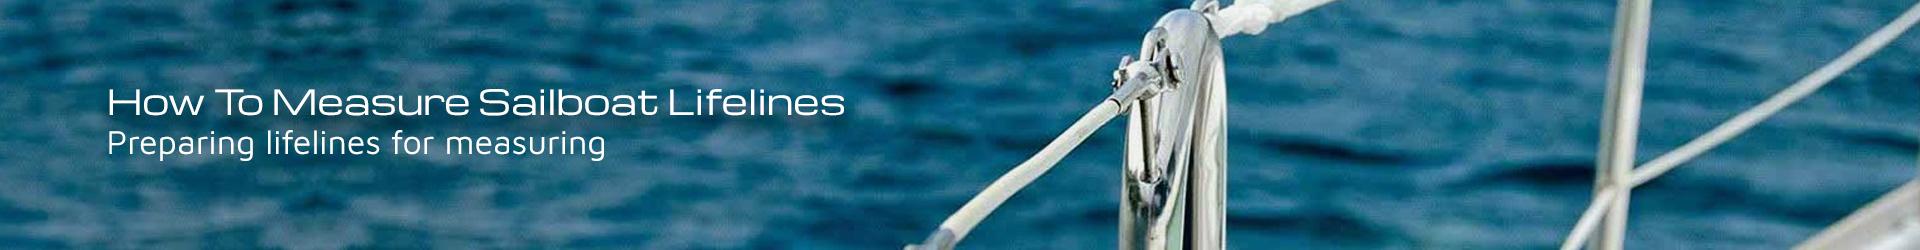 How to Measure Sailboat Lifelines